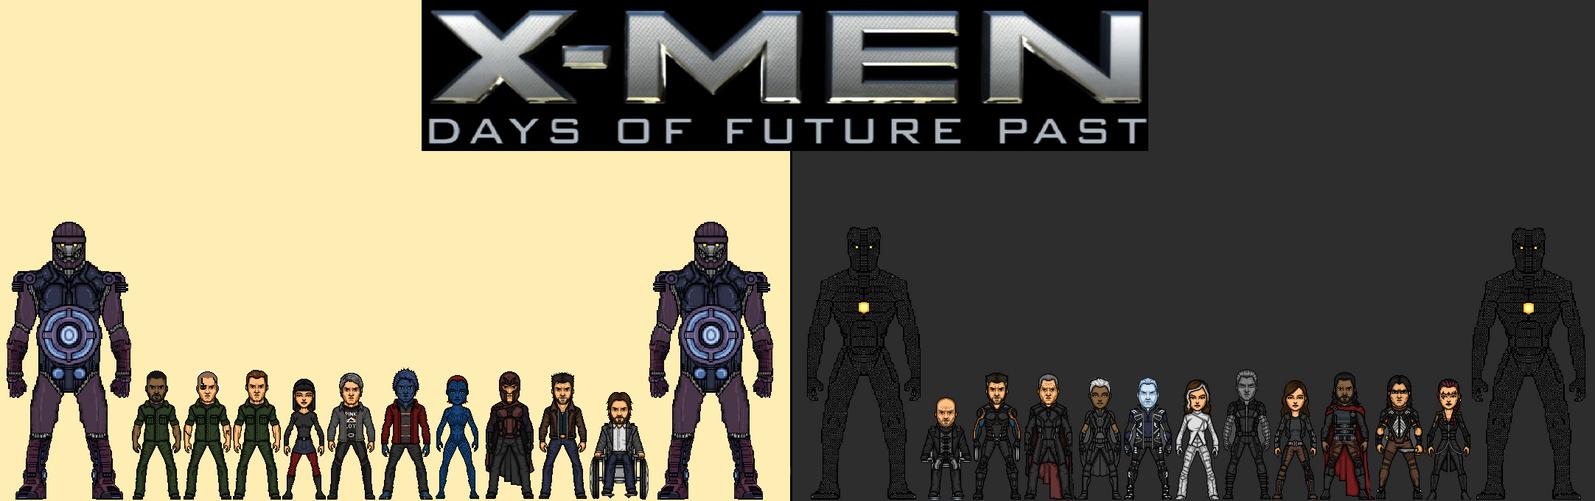 X men days of future past ink